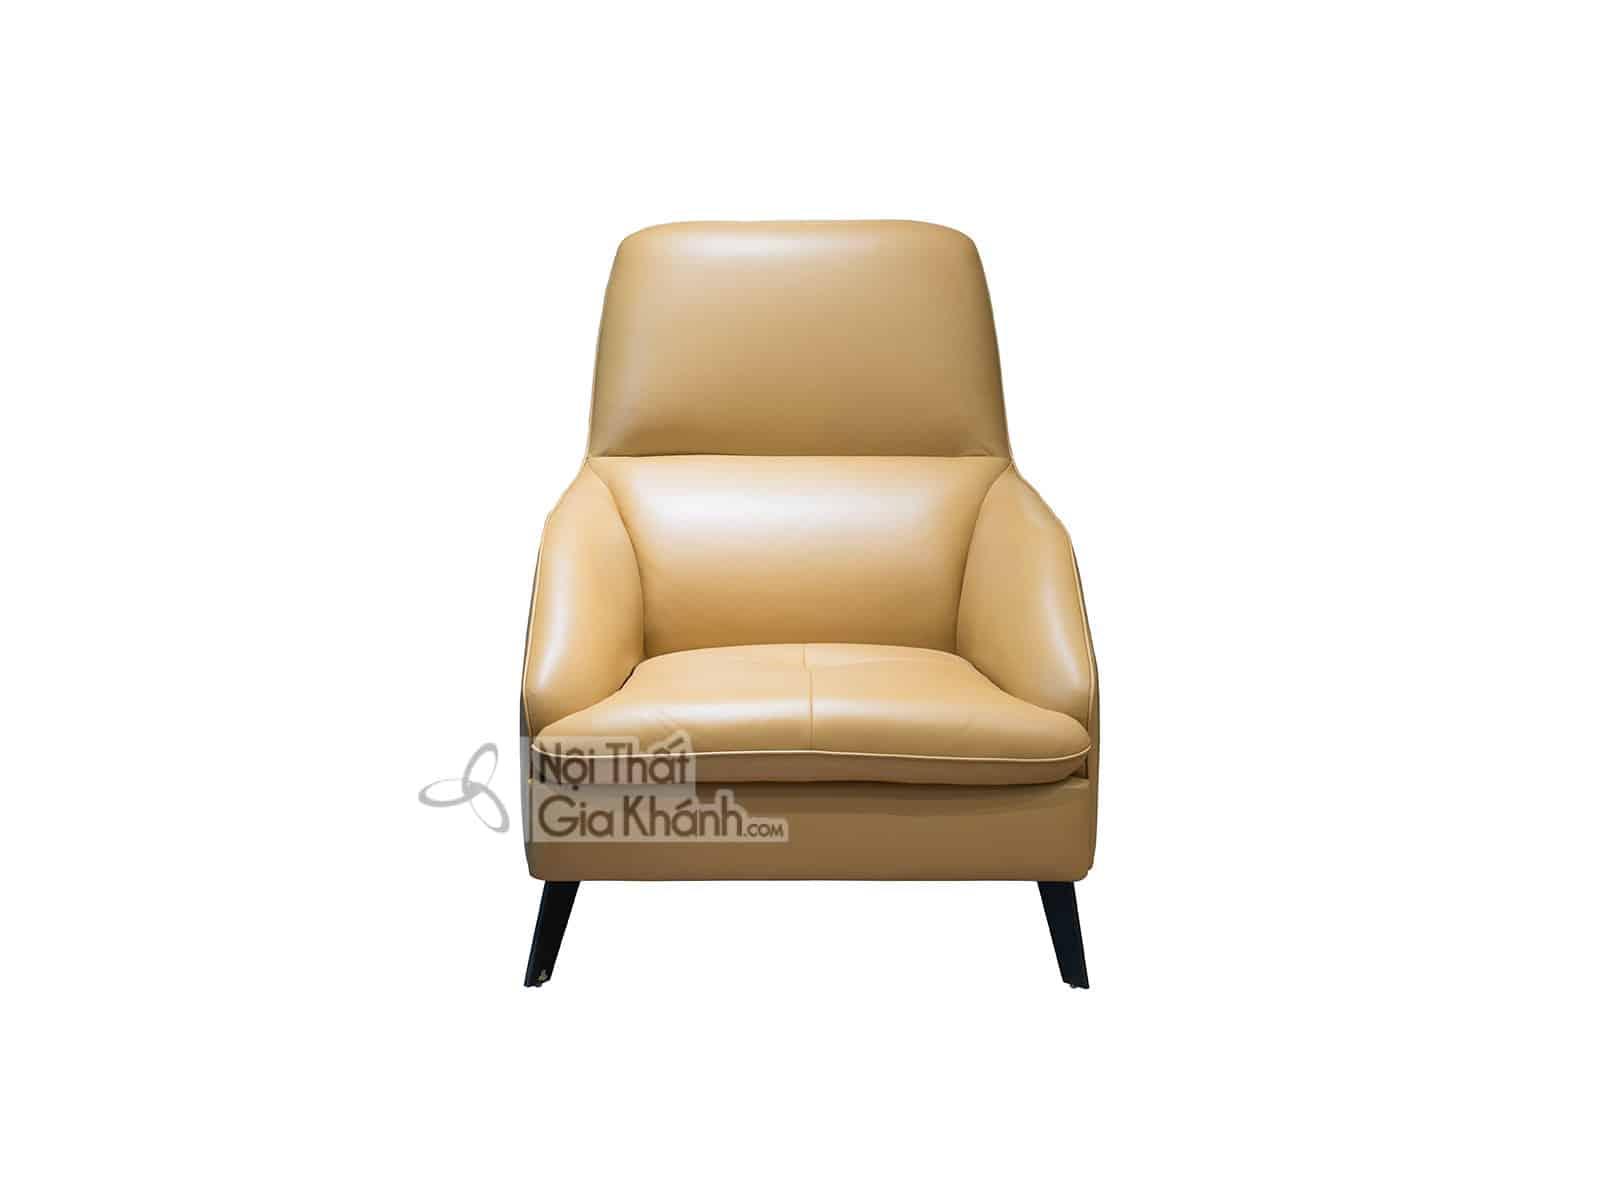 Ghế sofa thư giãn bọc da GT1809